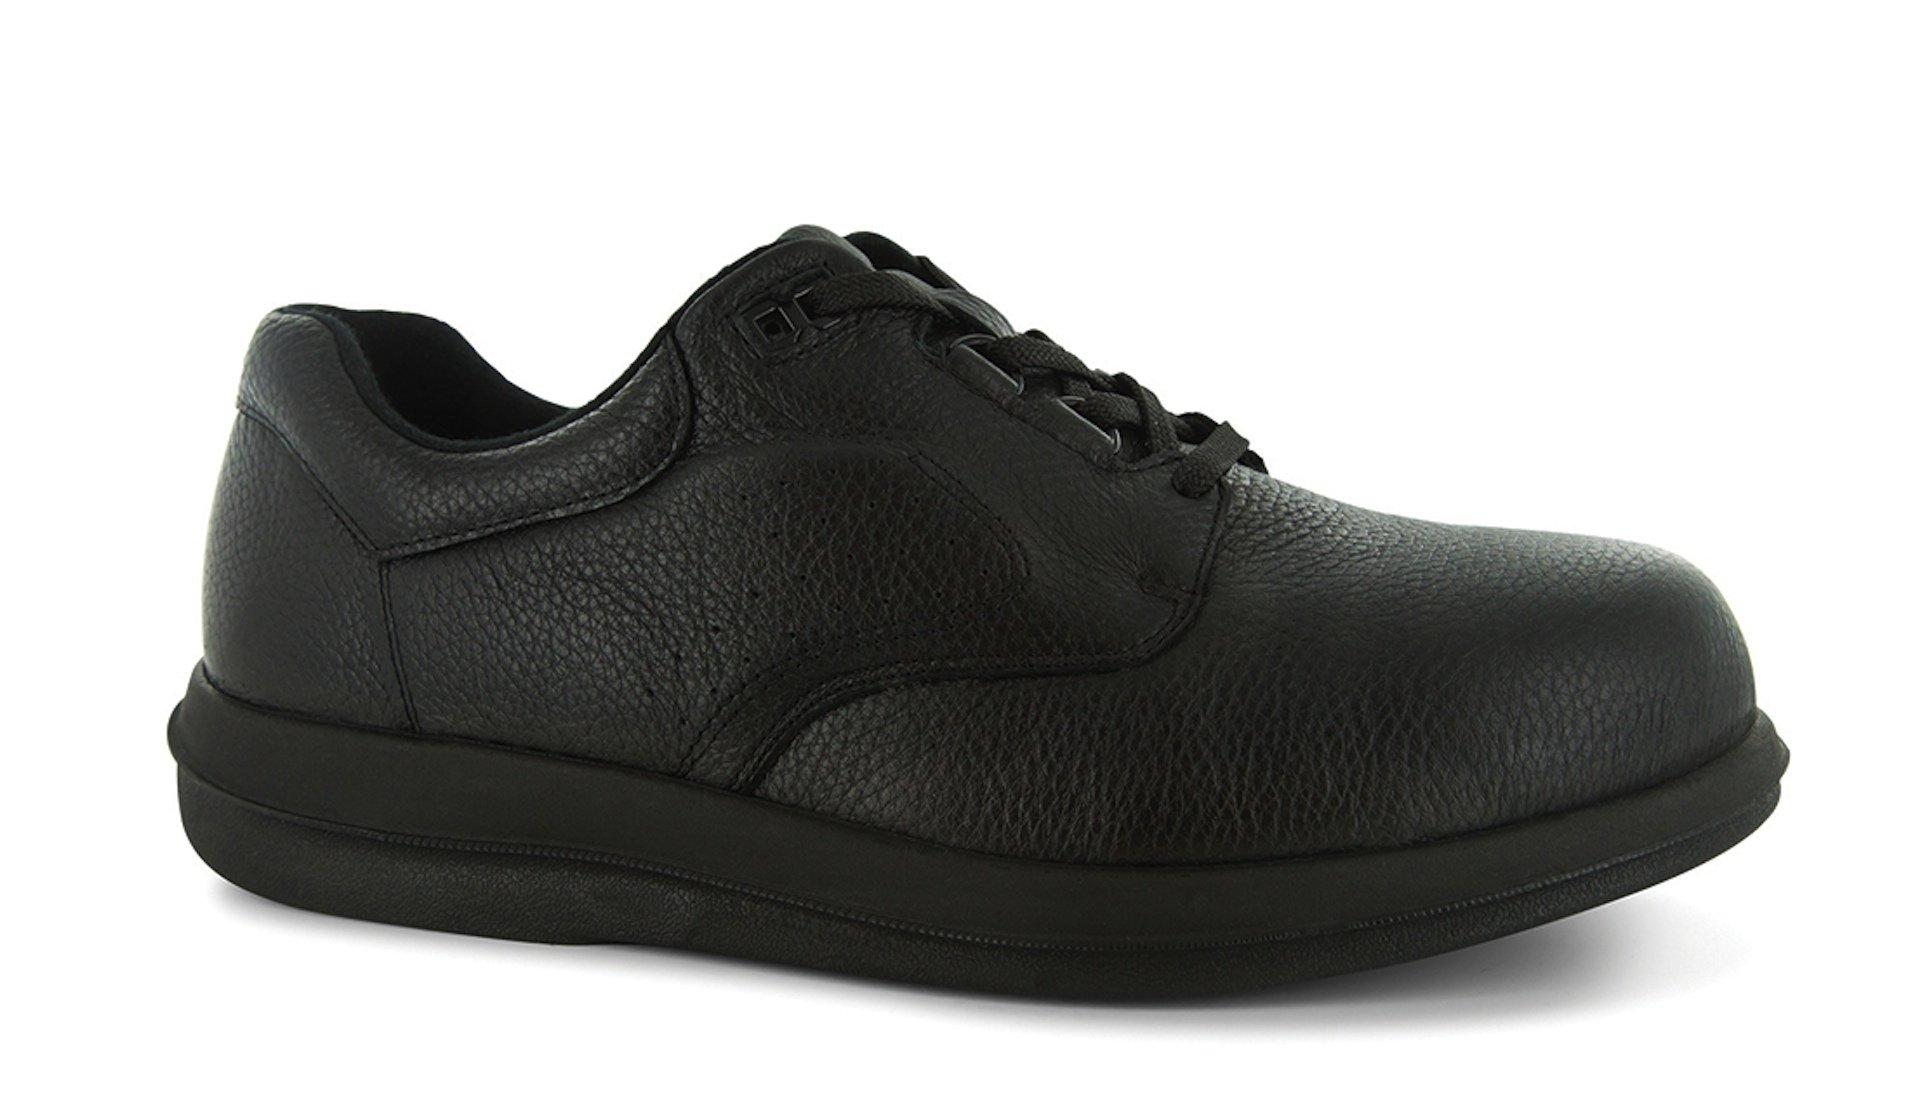 P W Minor Leisure Time Men's Therapeutic Extra Depth Shoe: Black 8 Wide (E) Lace